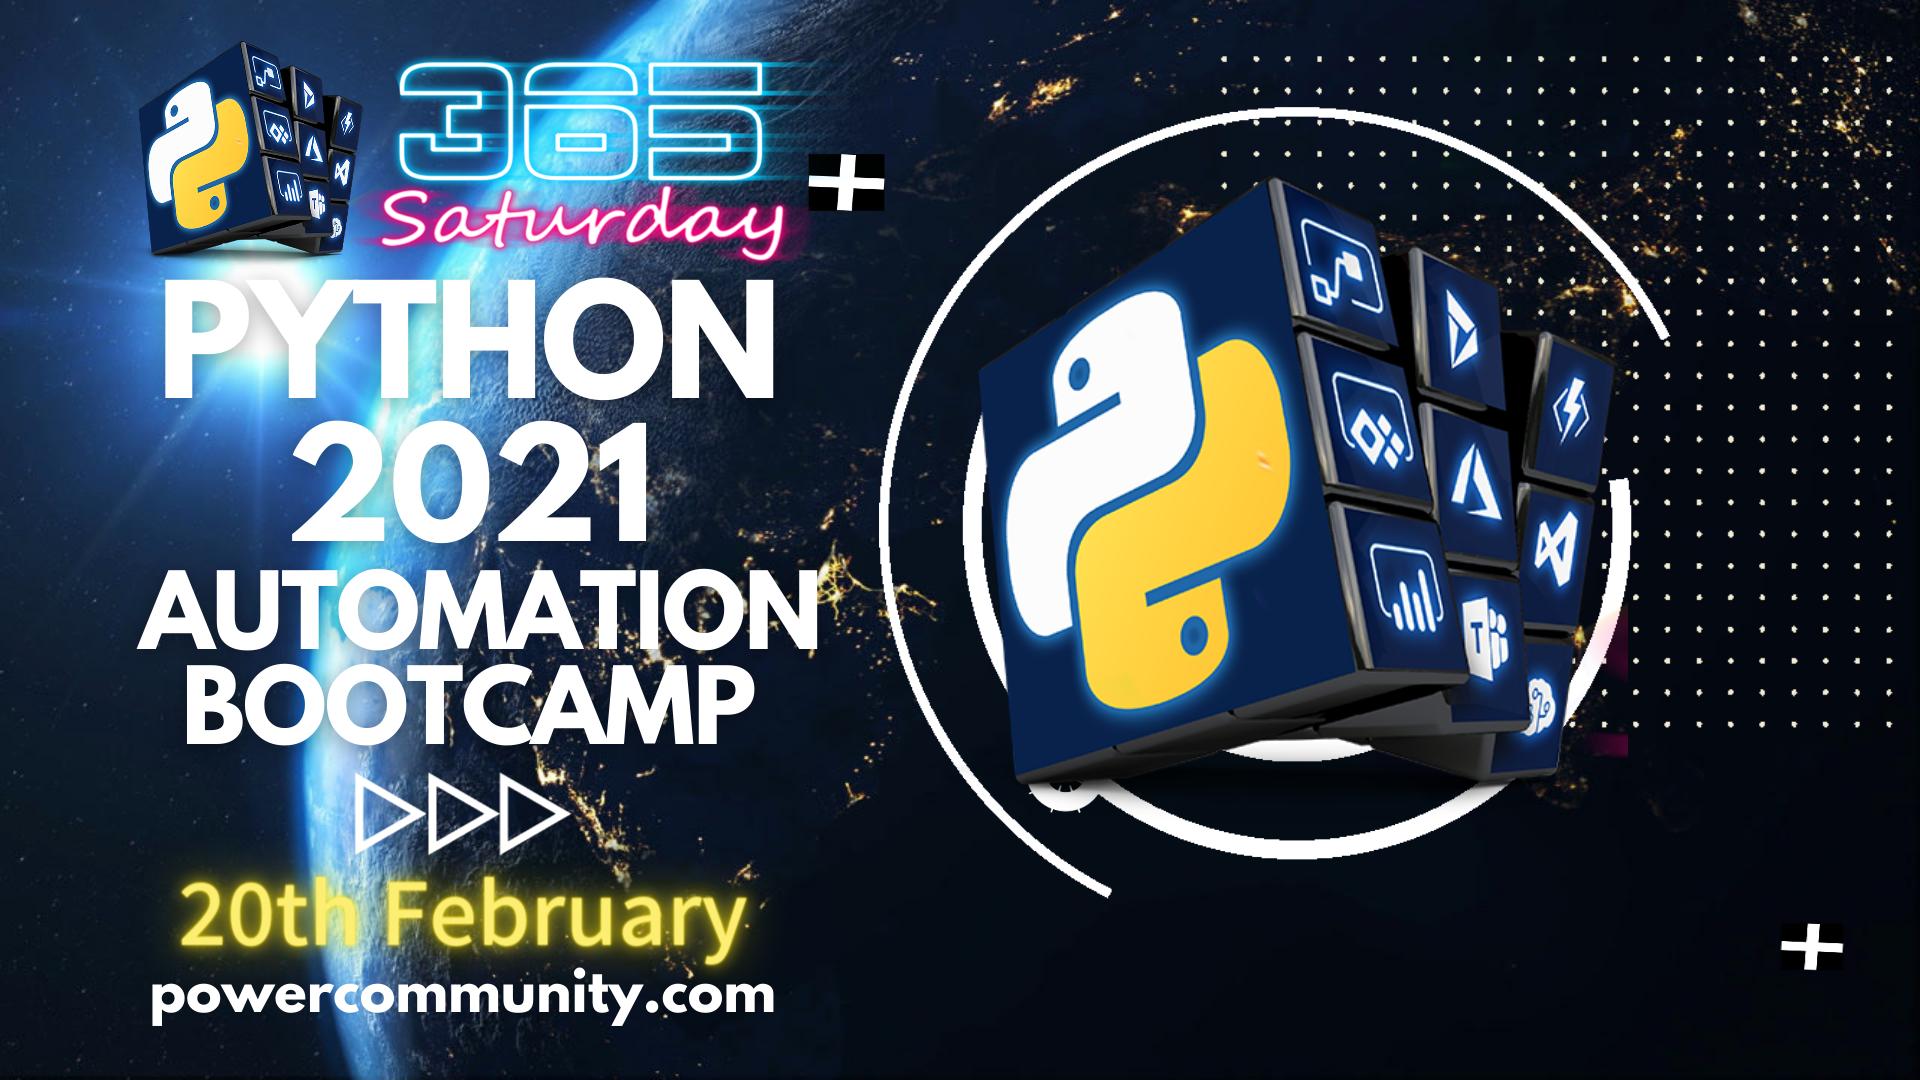 Python Saturday Automation Bootcamp 2021